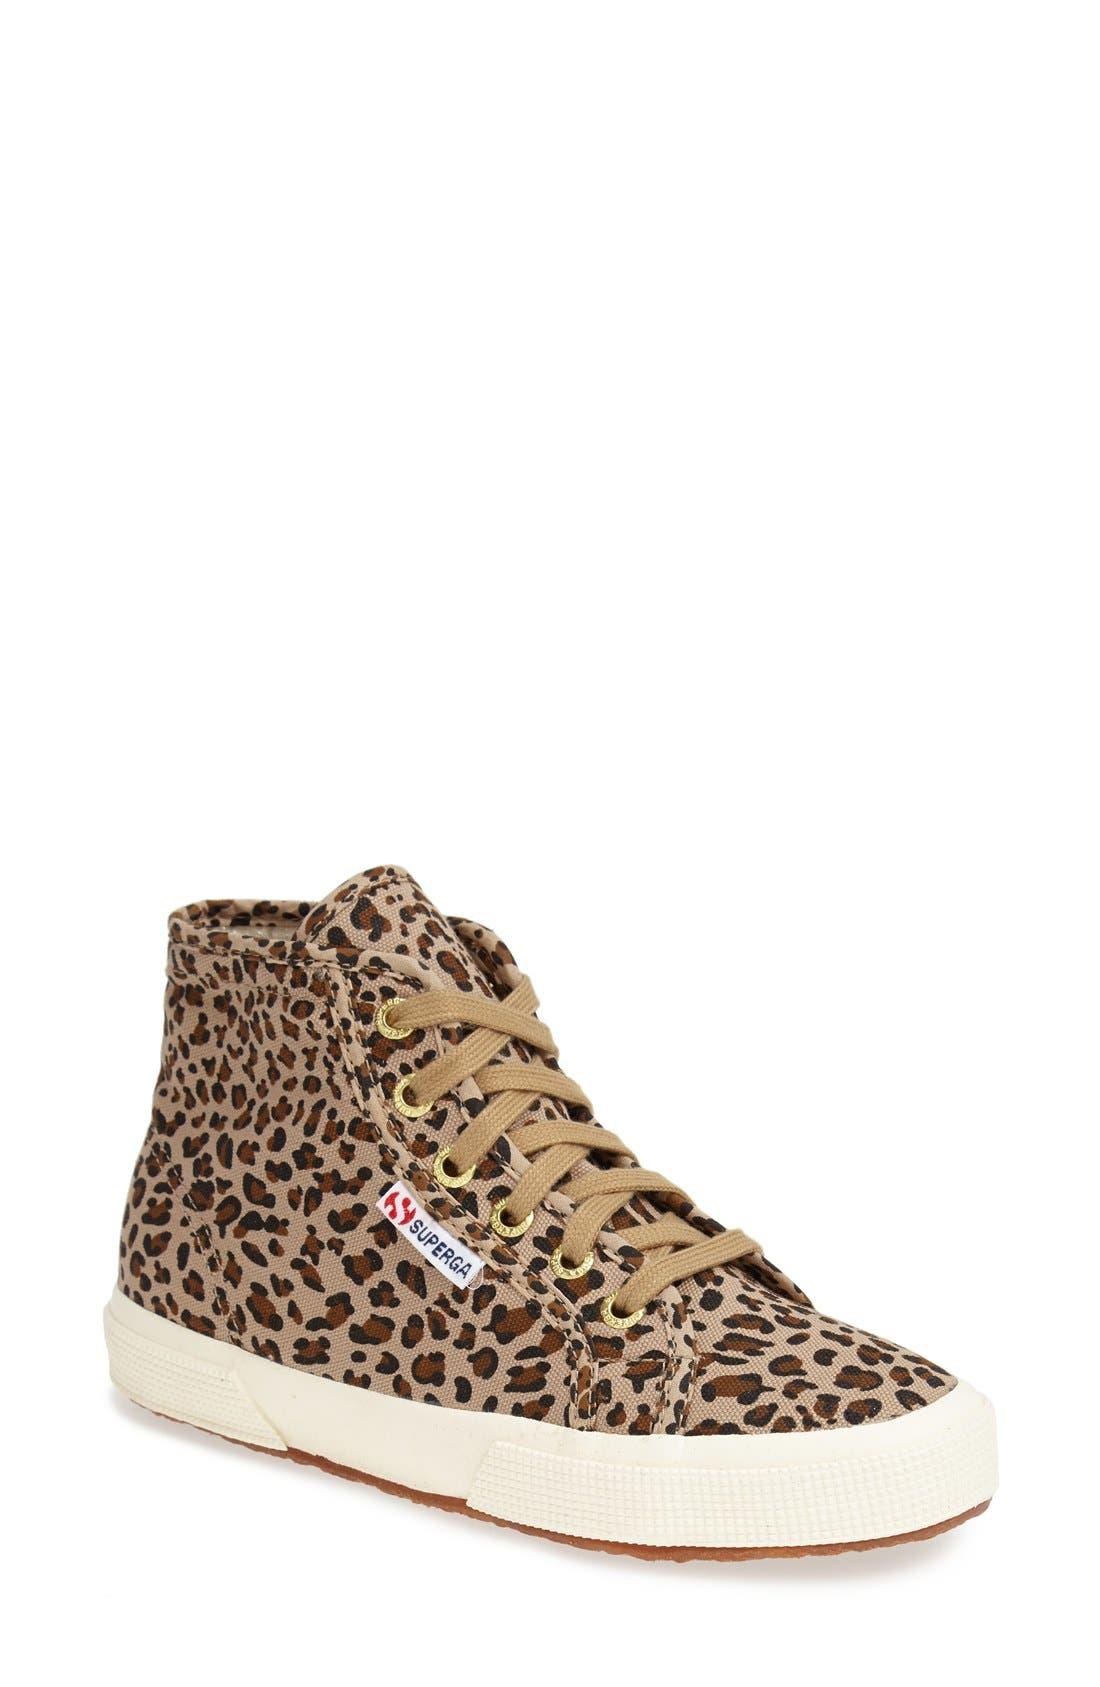 'Leo' High Top Sneaker,                             Main thumbnail 1, color,                             200